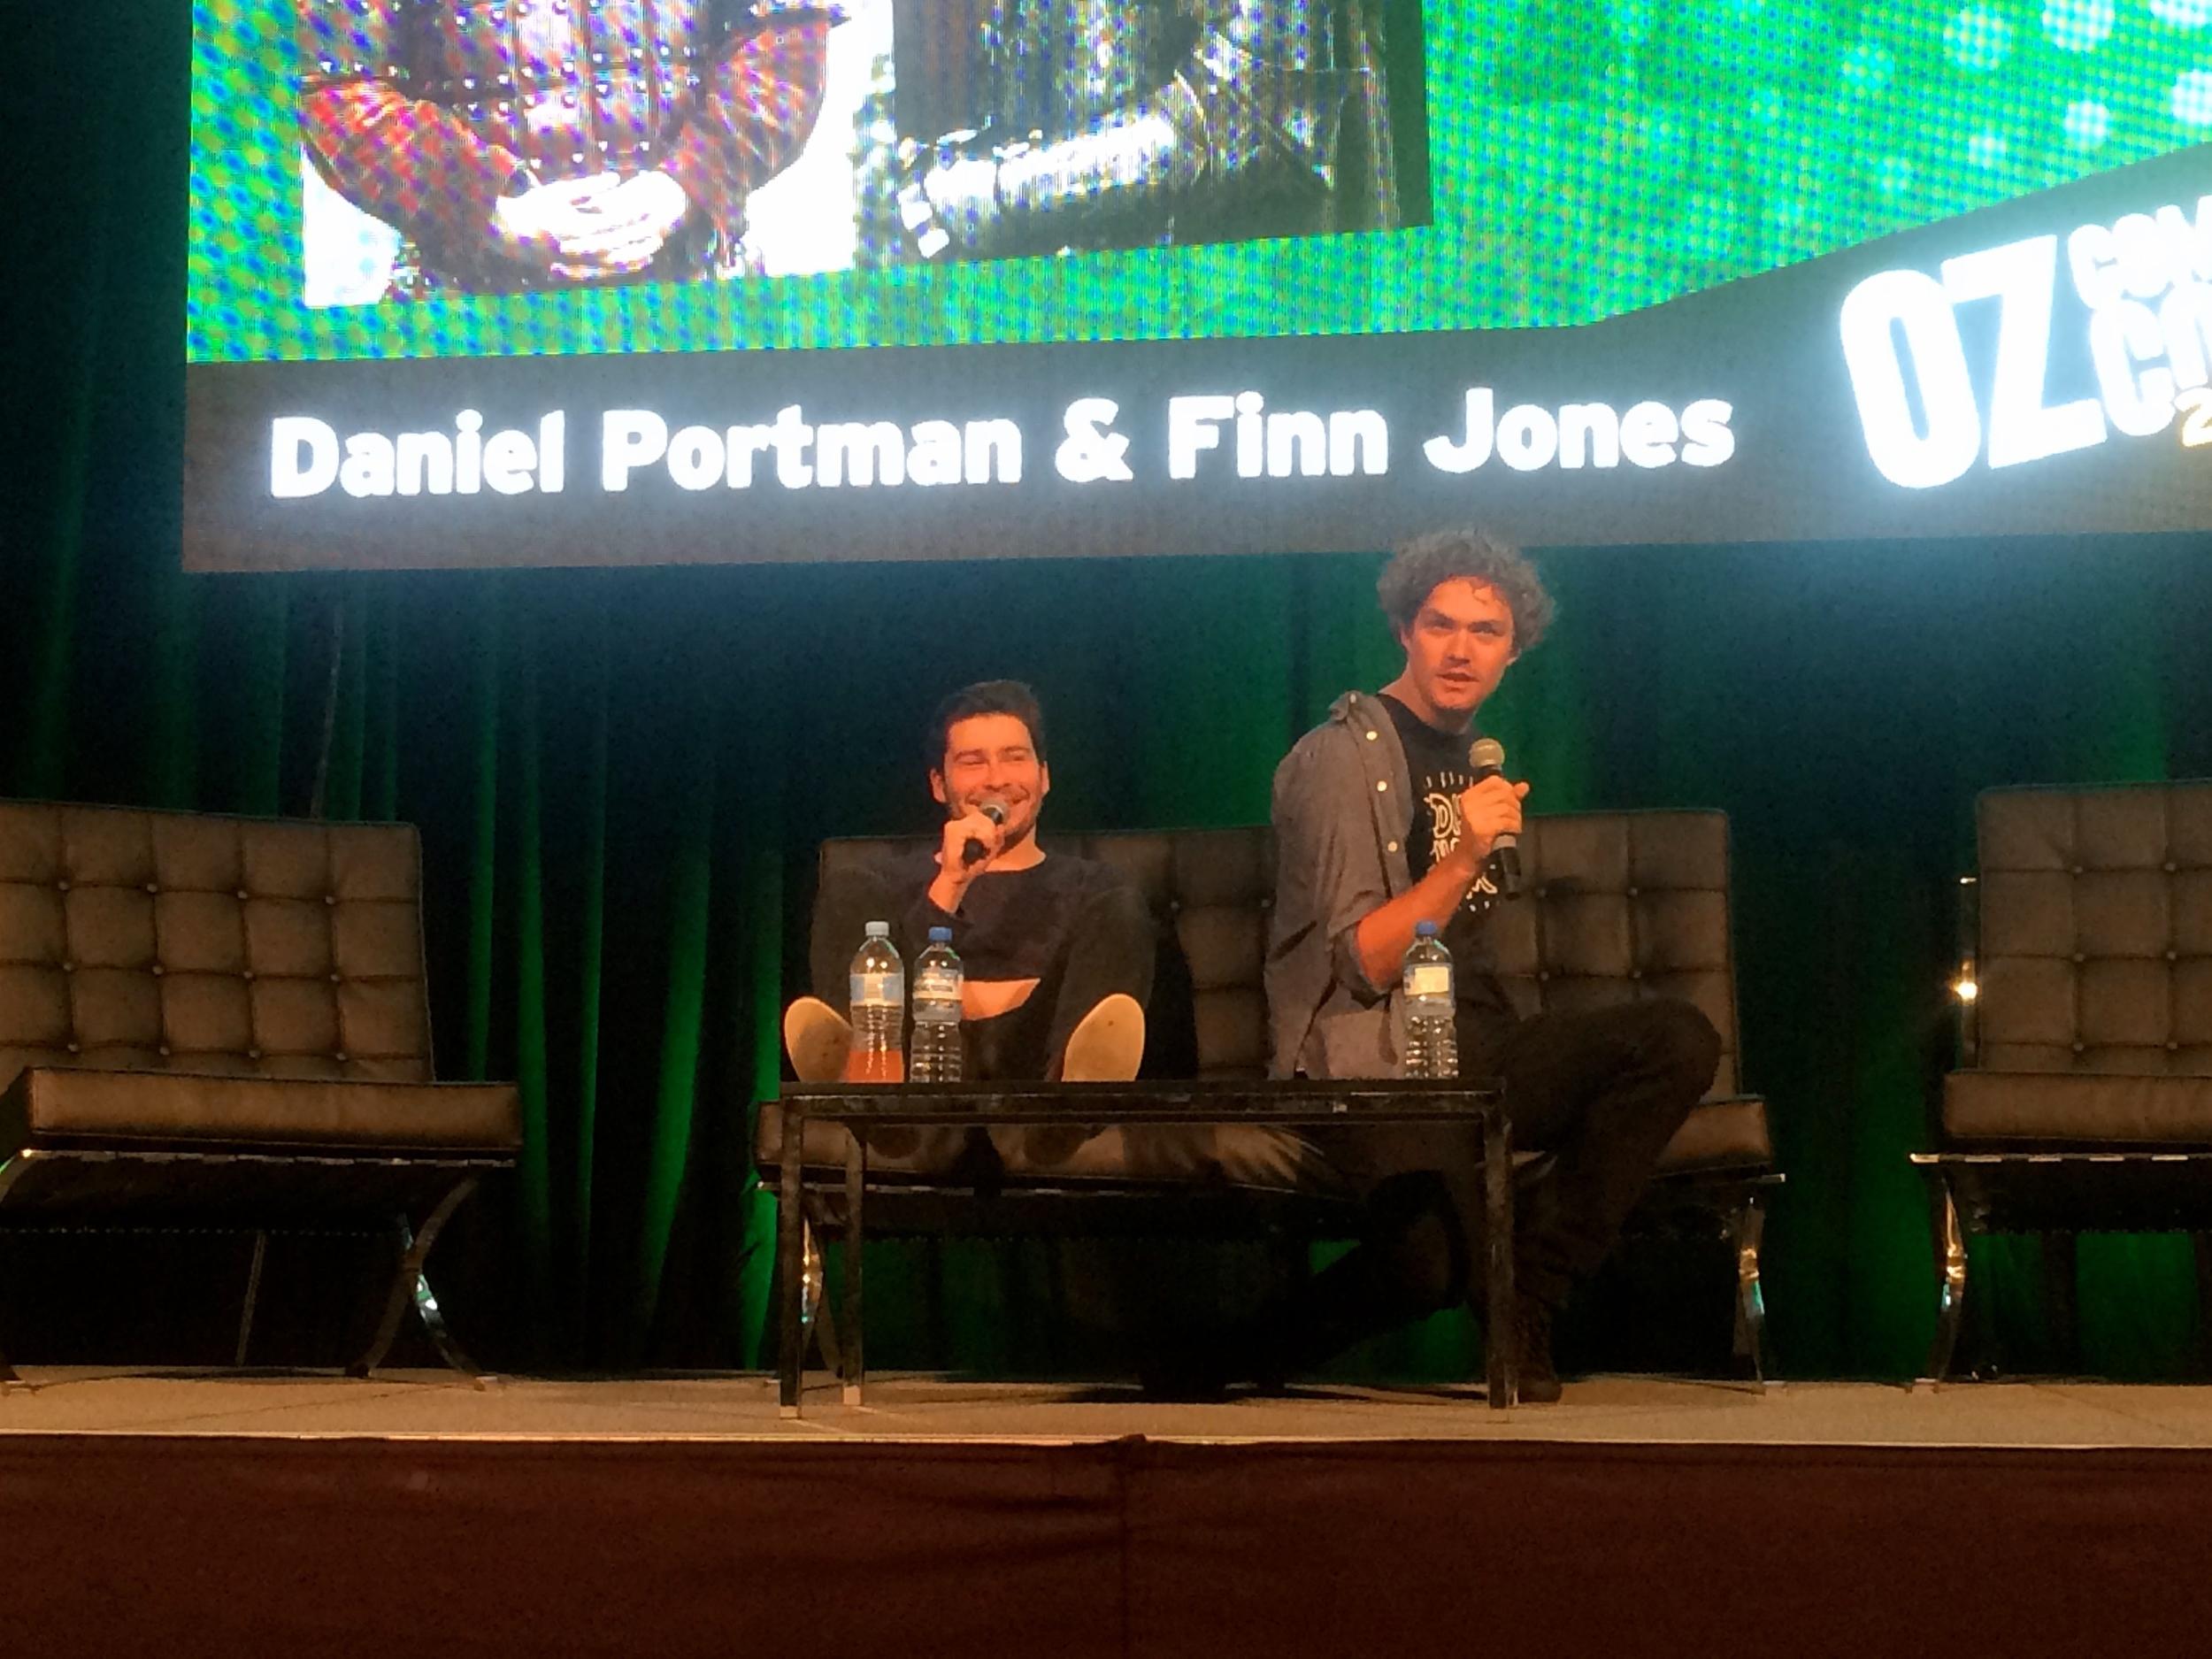 Finn Jones striking a pose for the photographing crowd, Daniel Portman seems amused.